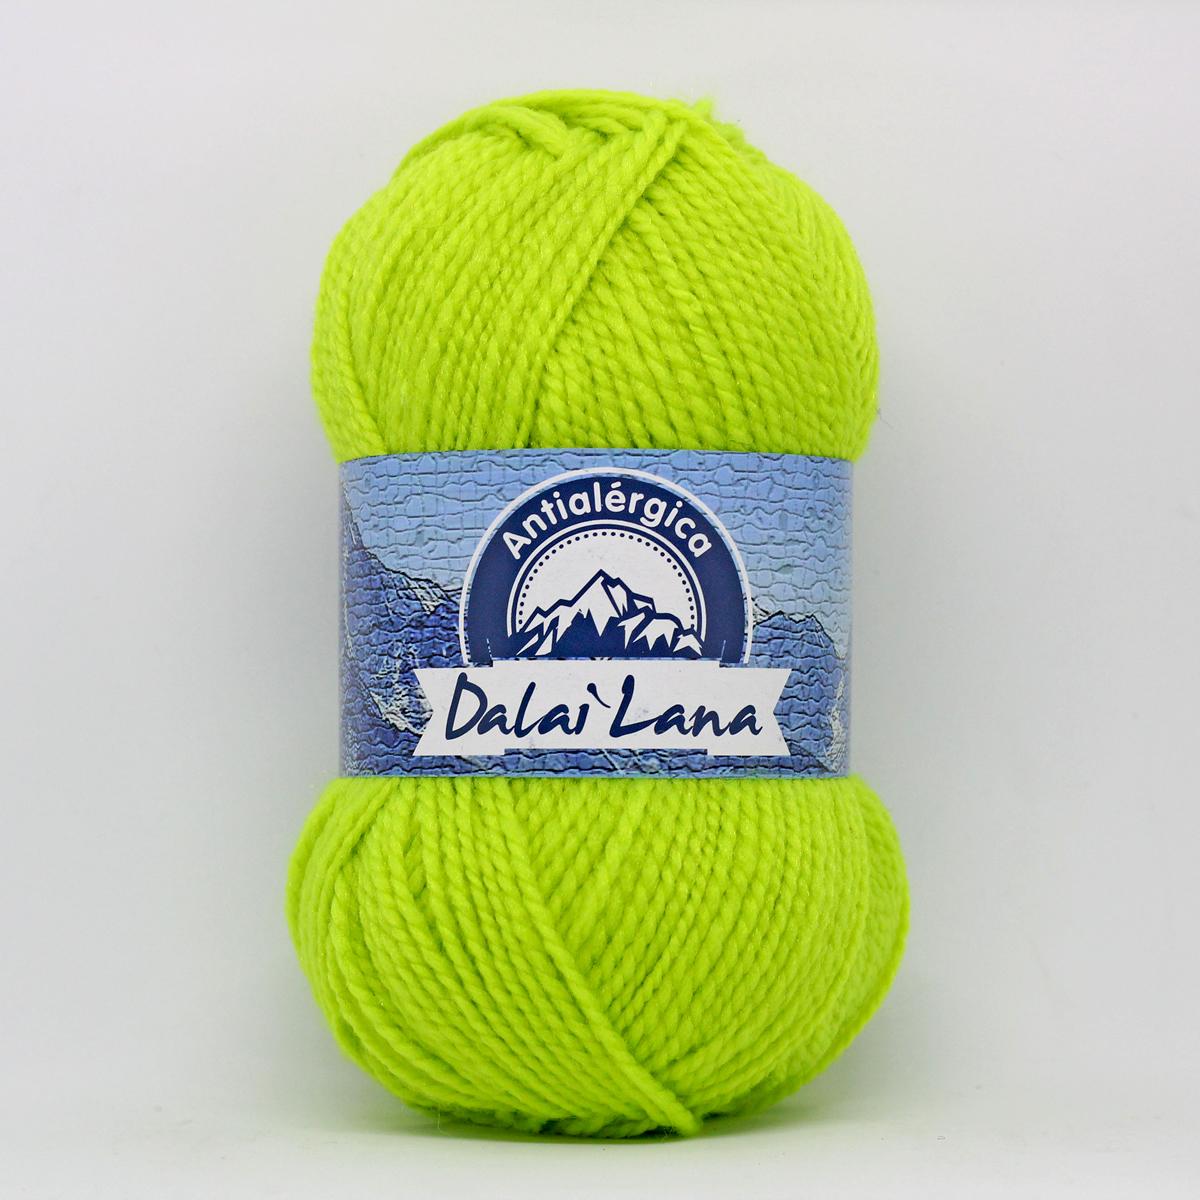 Dalai Lana - 758